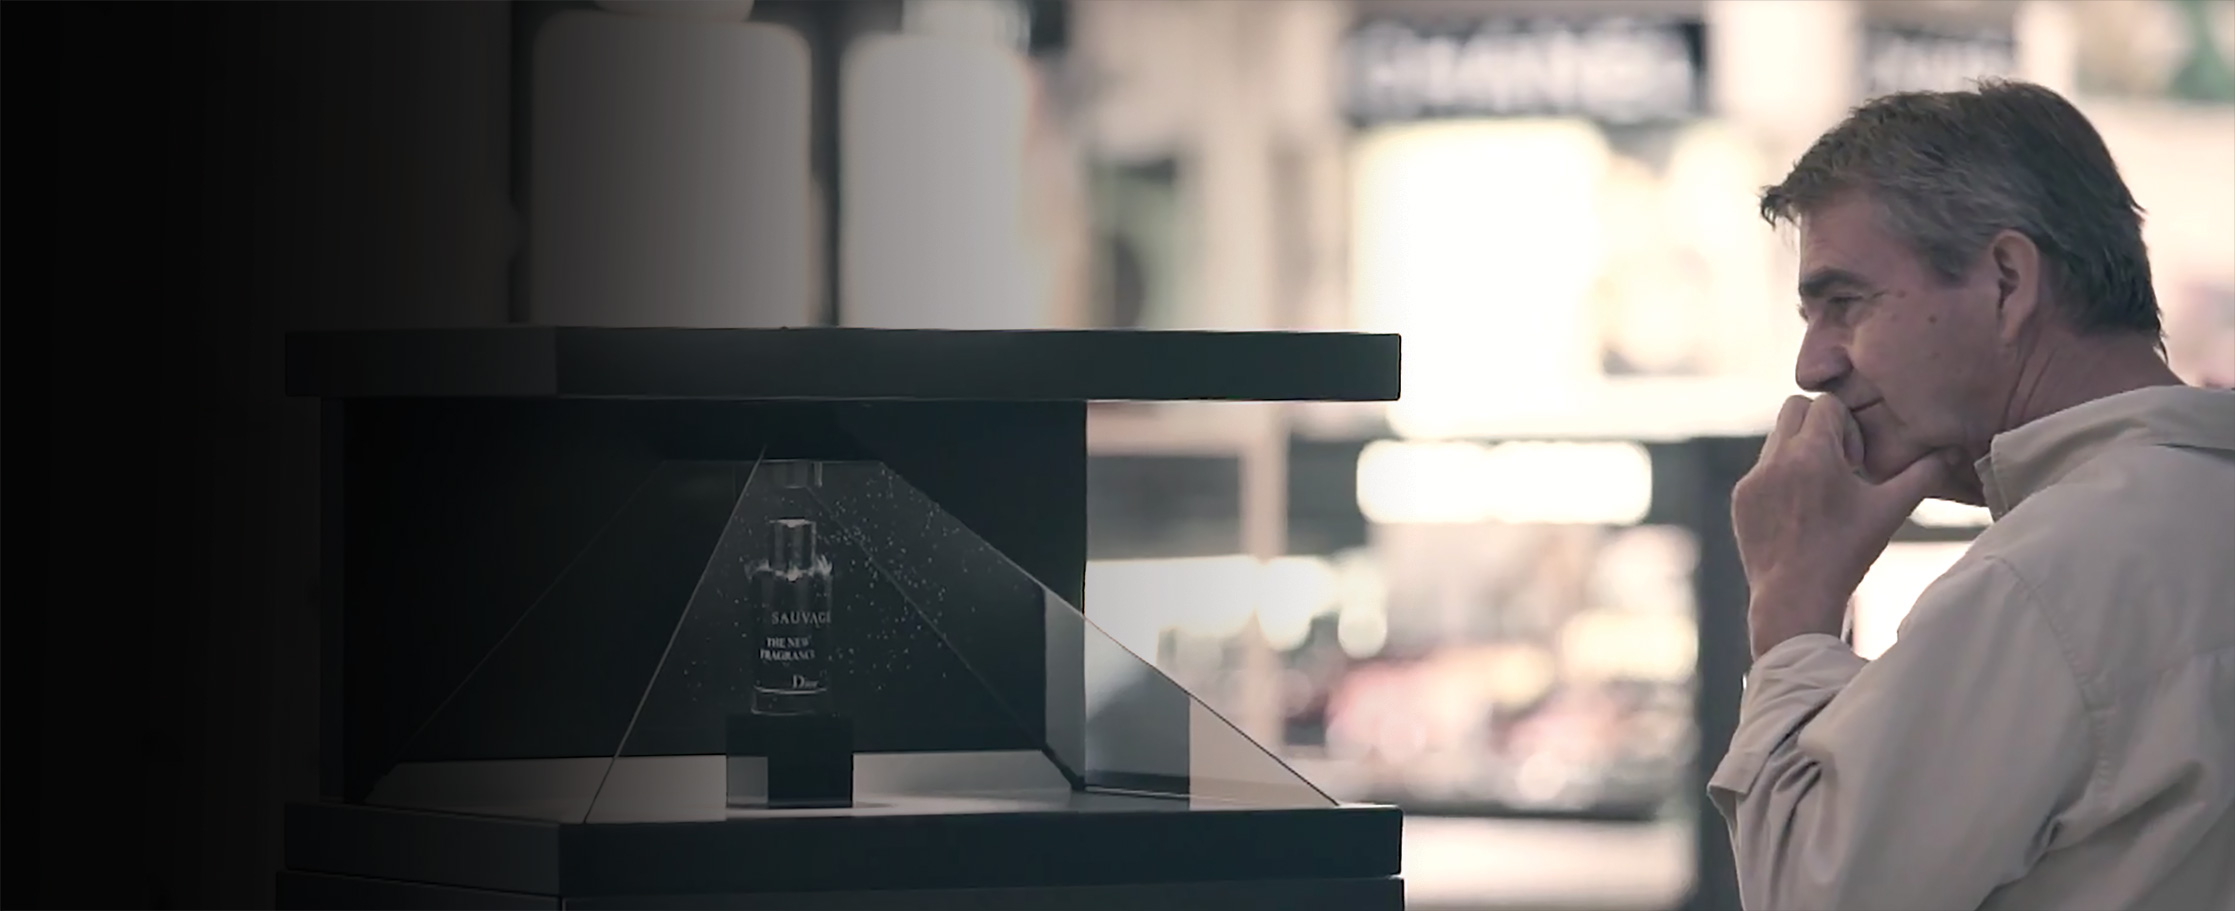 Dreamoc XXL3 - Holographic display